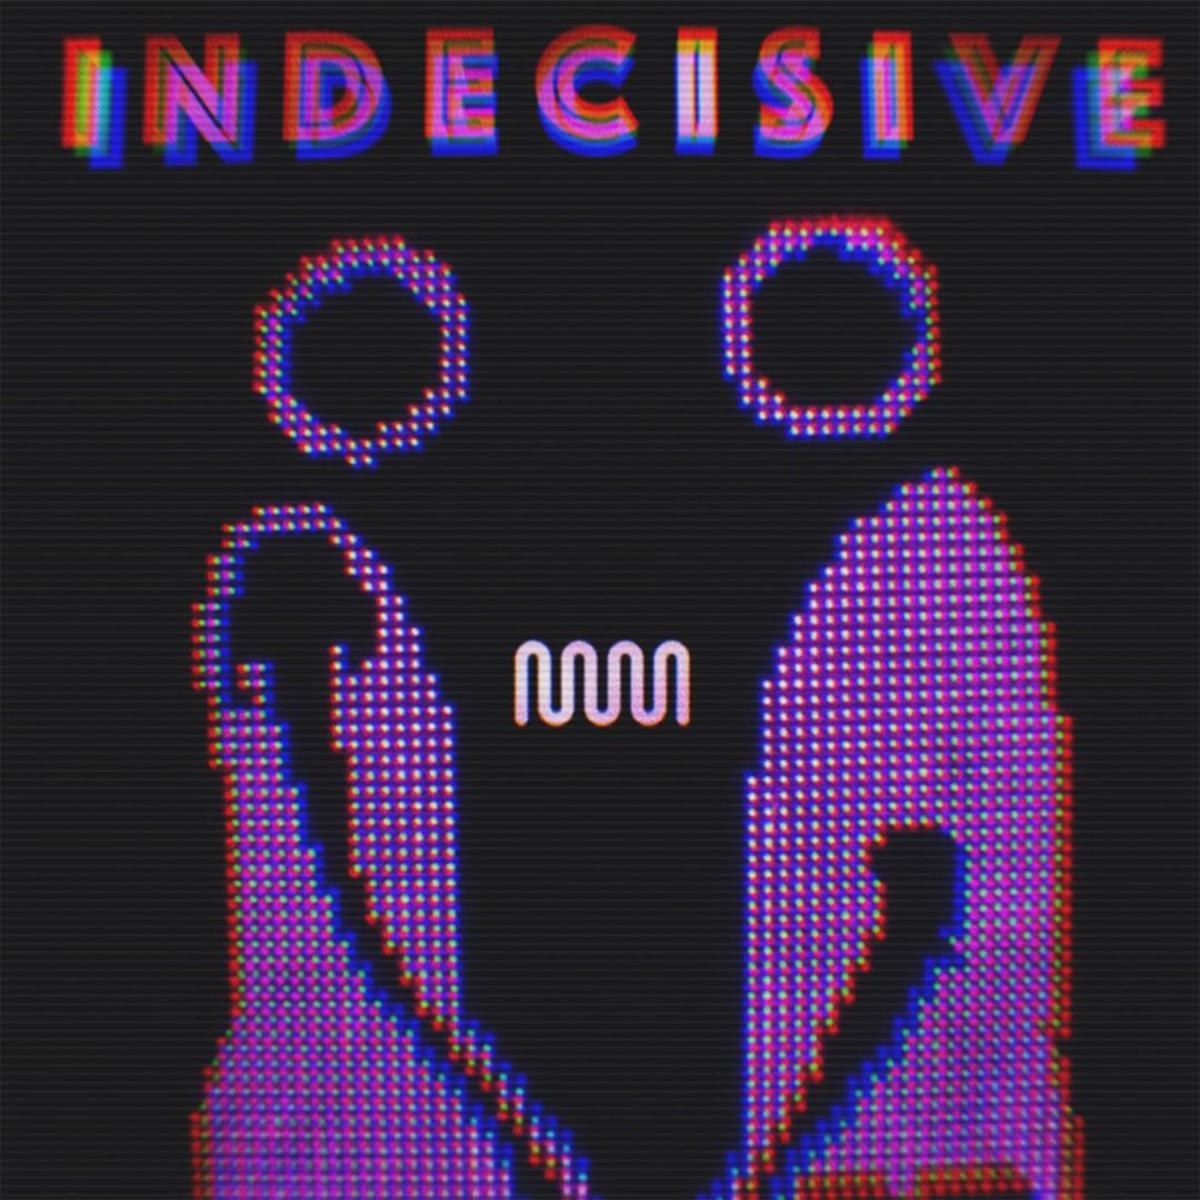 Mind Massage - Indecisive (ALBUM ARTWORK)